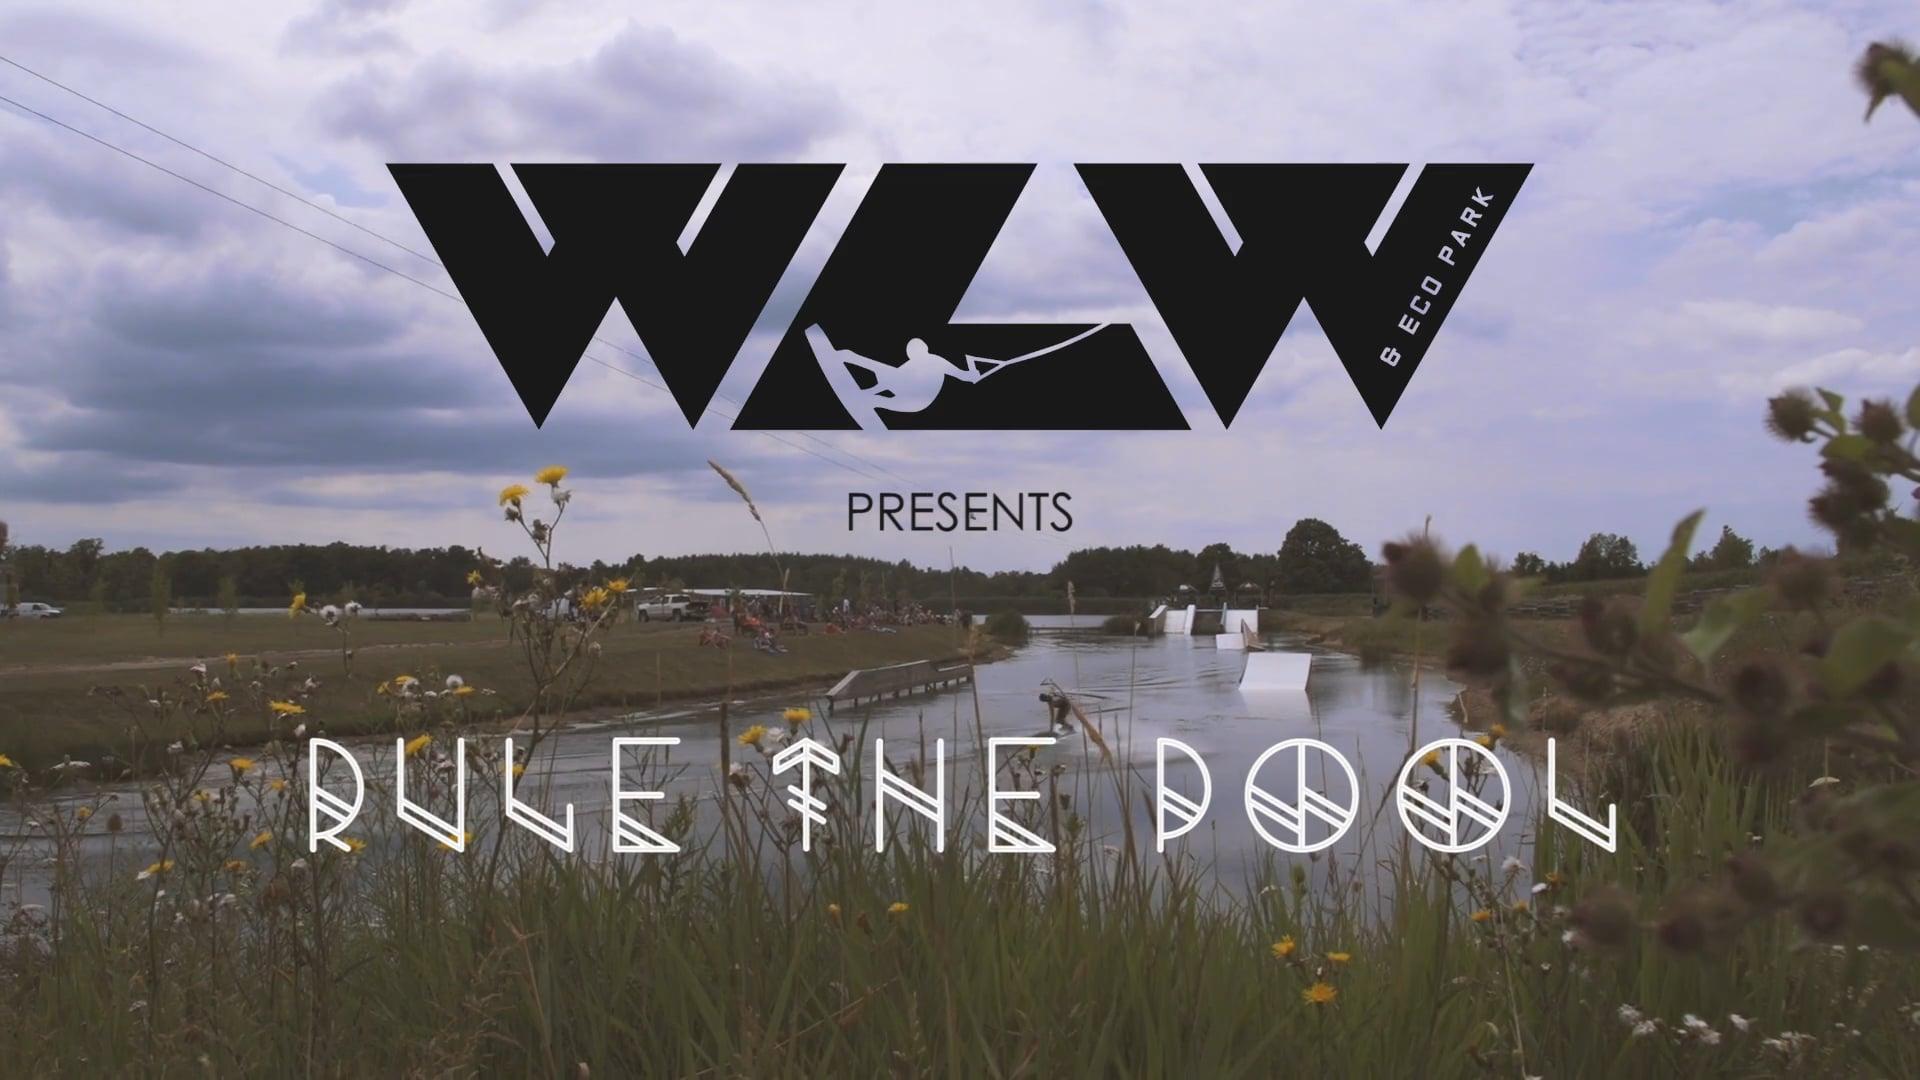 WINDMILL LAKE 2016 RULE THE POOL